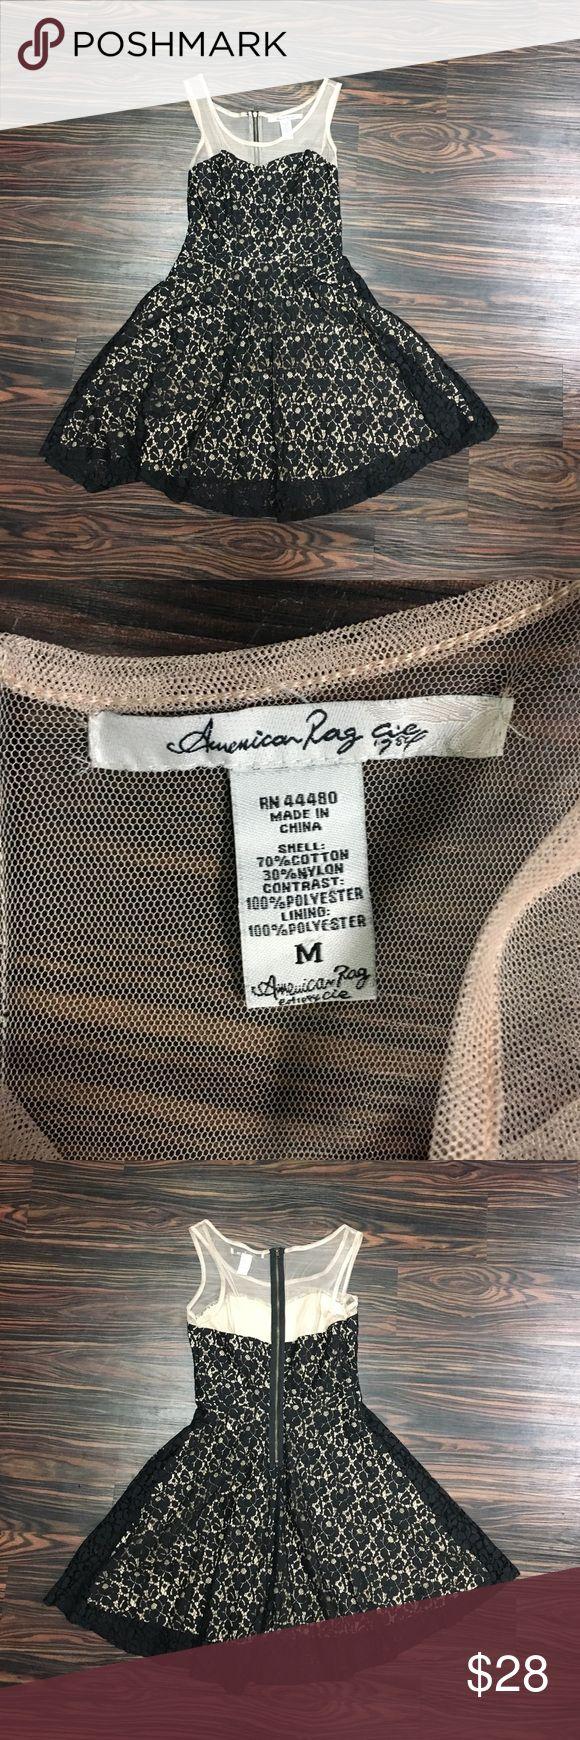 American rag lace dress Beautiful Black illusion lace skater dress by American Rag! American Rag Dresses Mini